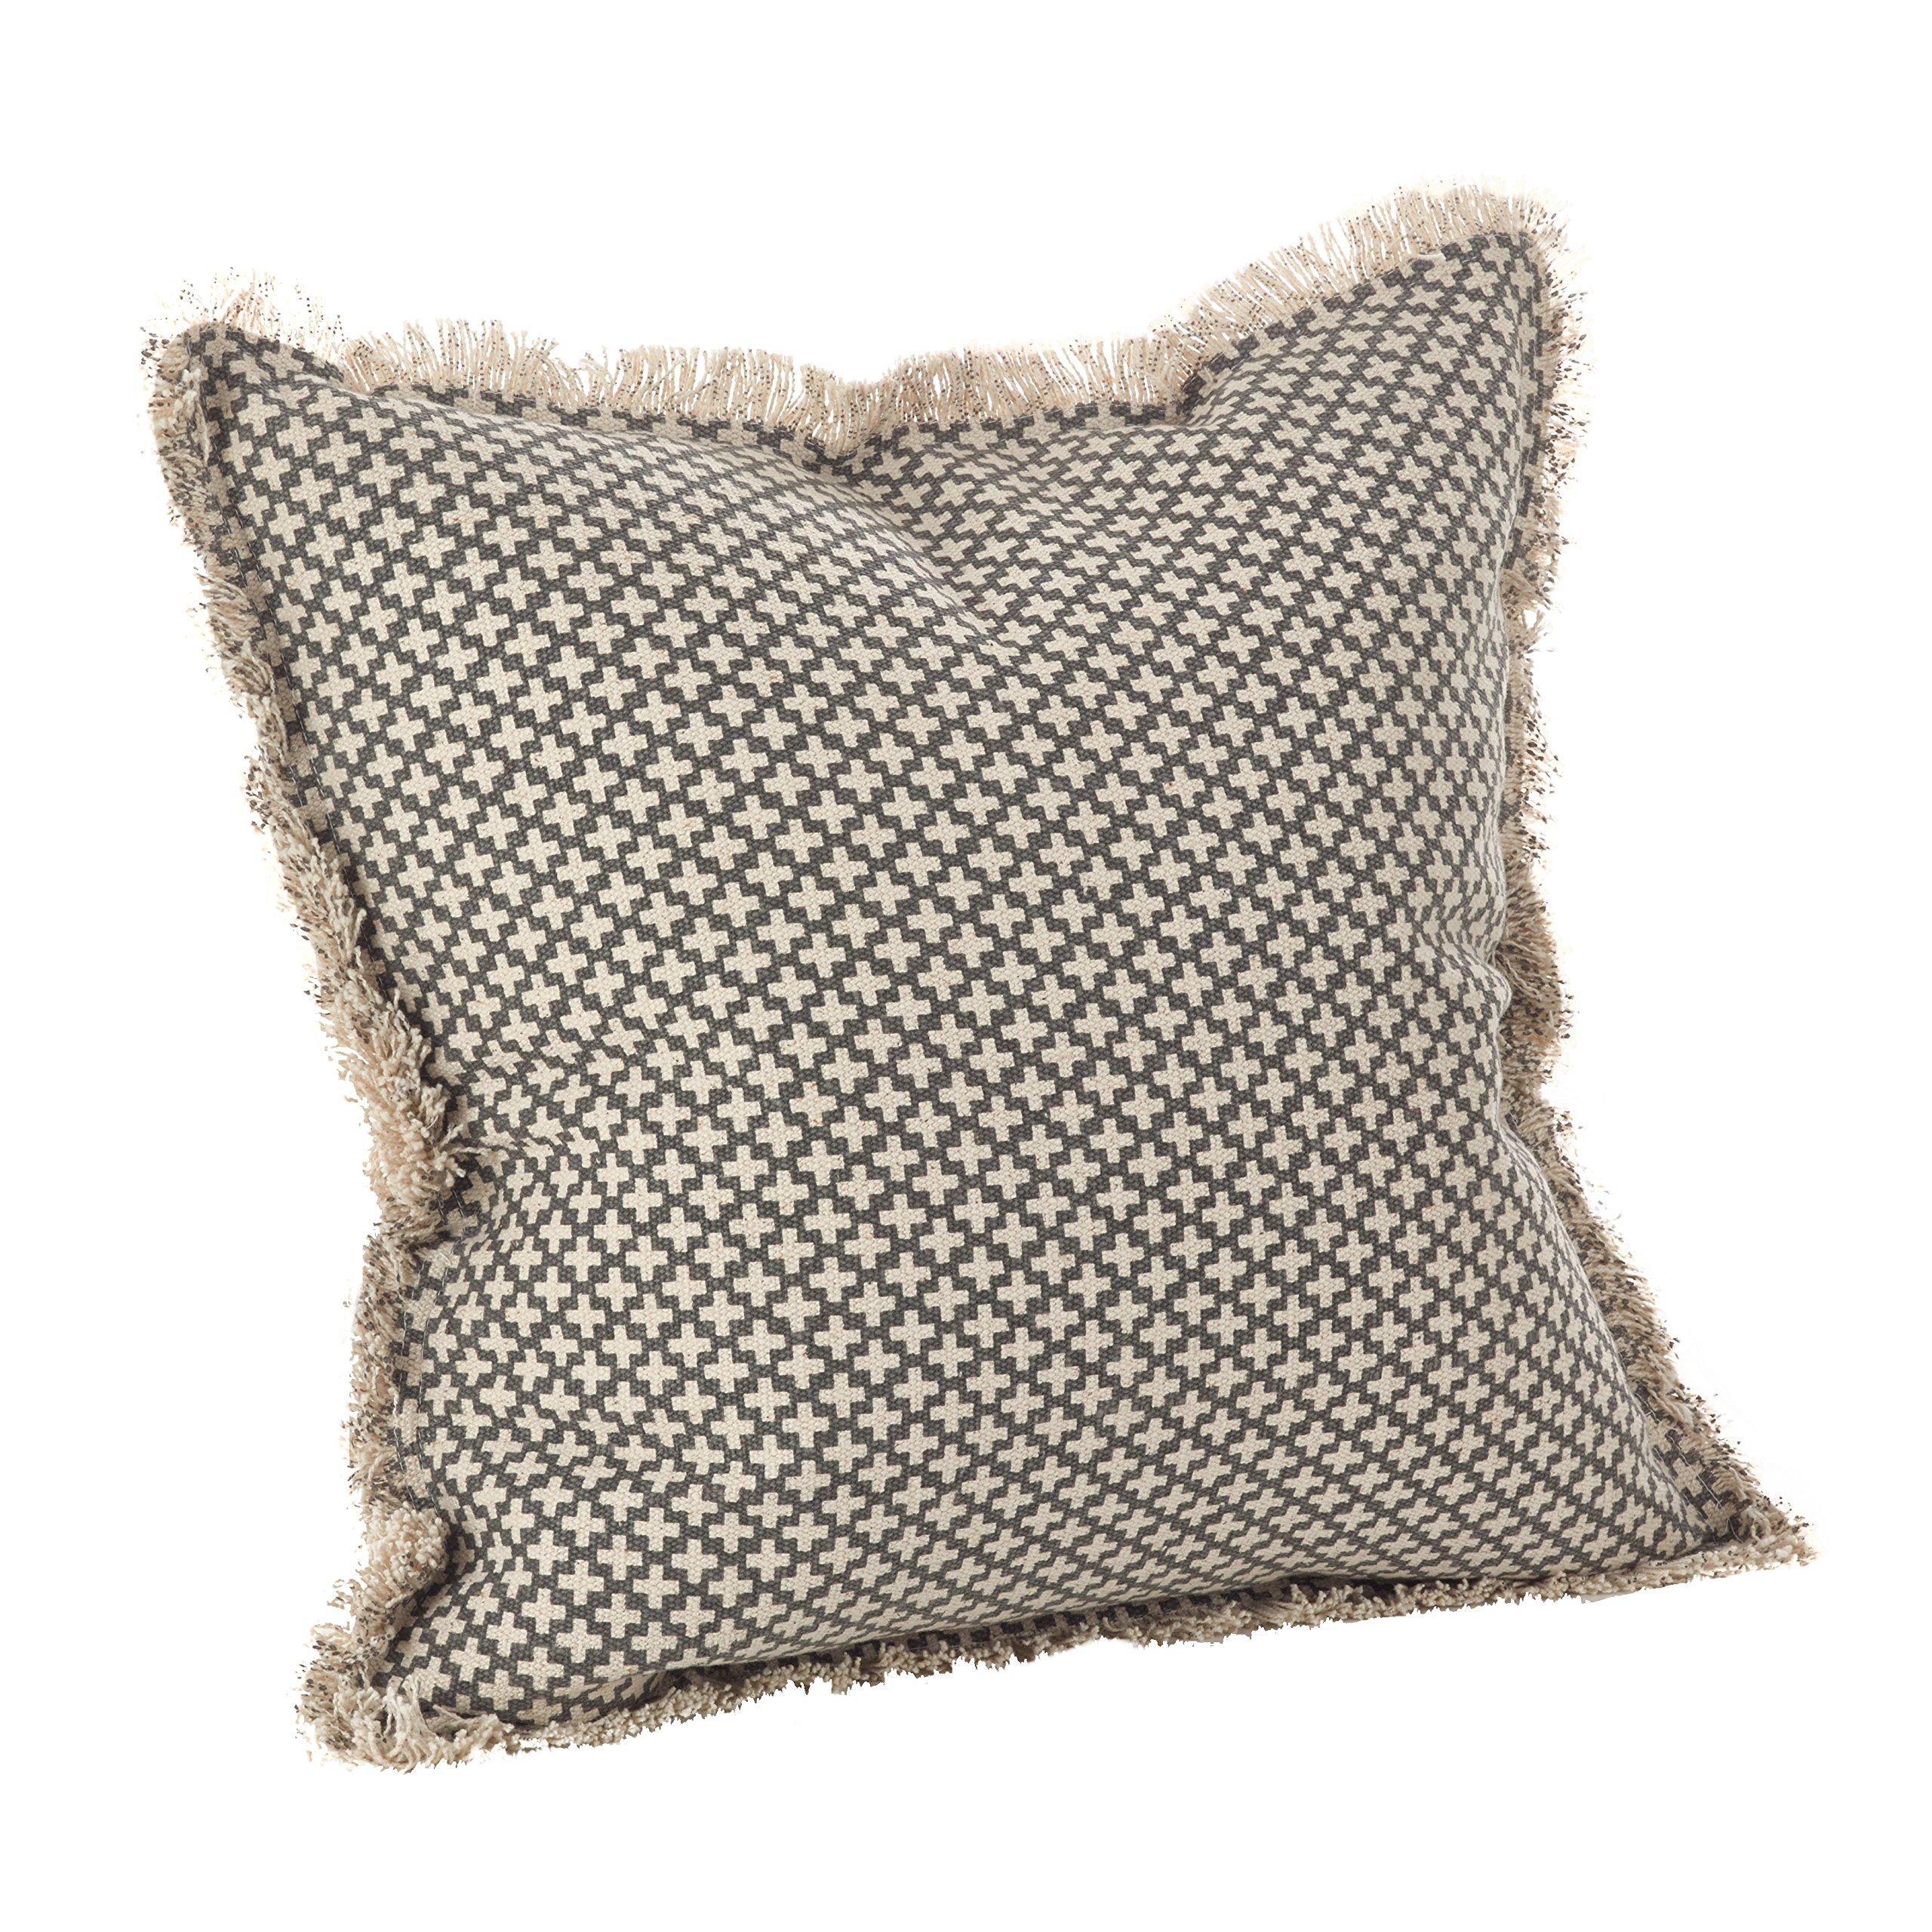 SARO LIFESTYLE Corinth Collection Moroccan Tile Design Down Filled Cotton Throw Pillow, 20'', Slate by SARO LIFESTYLE